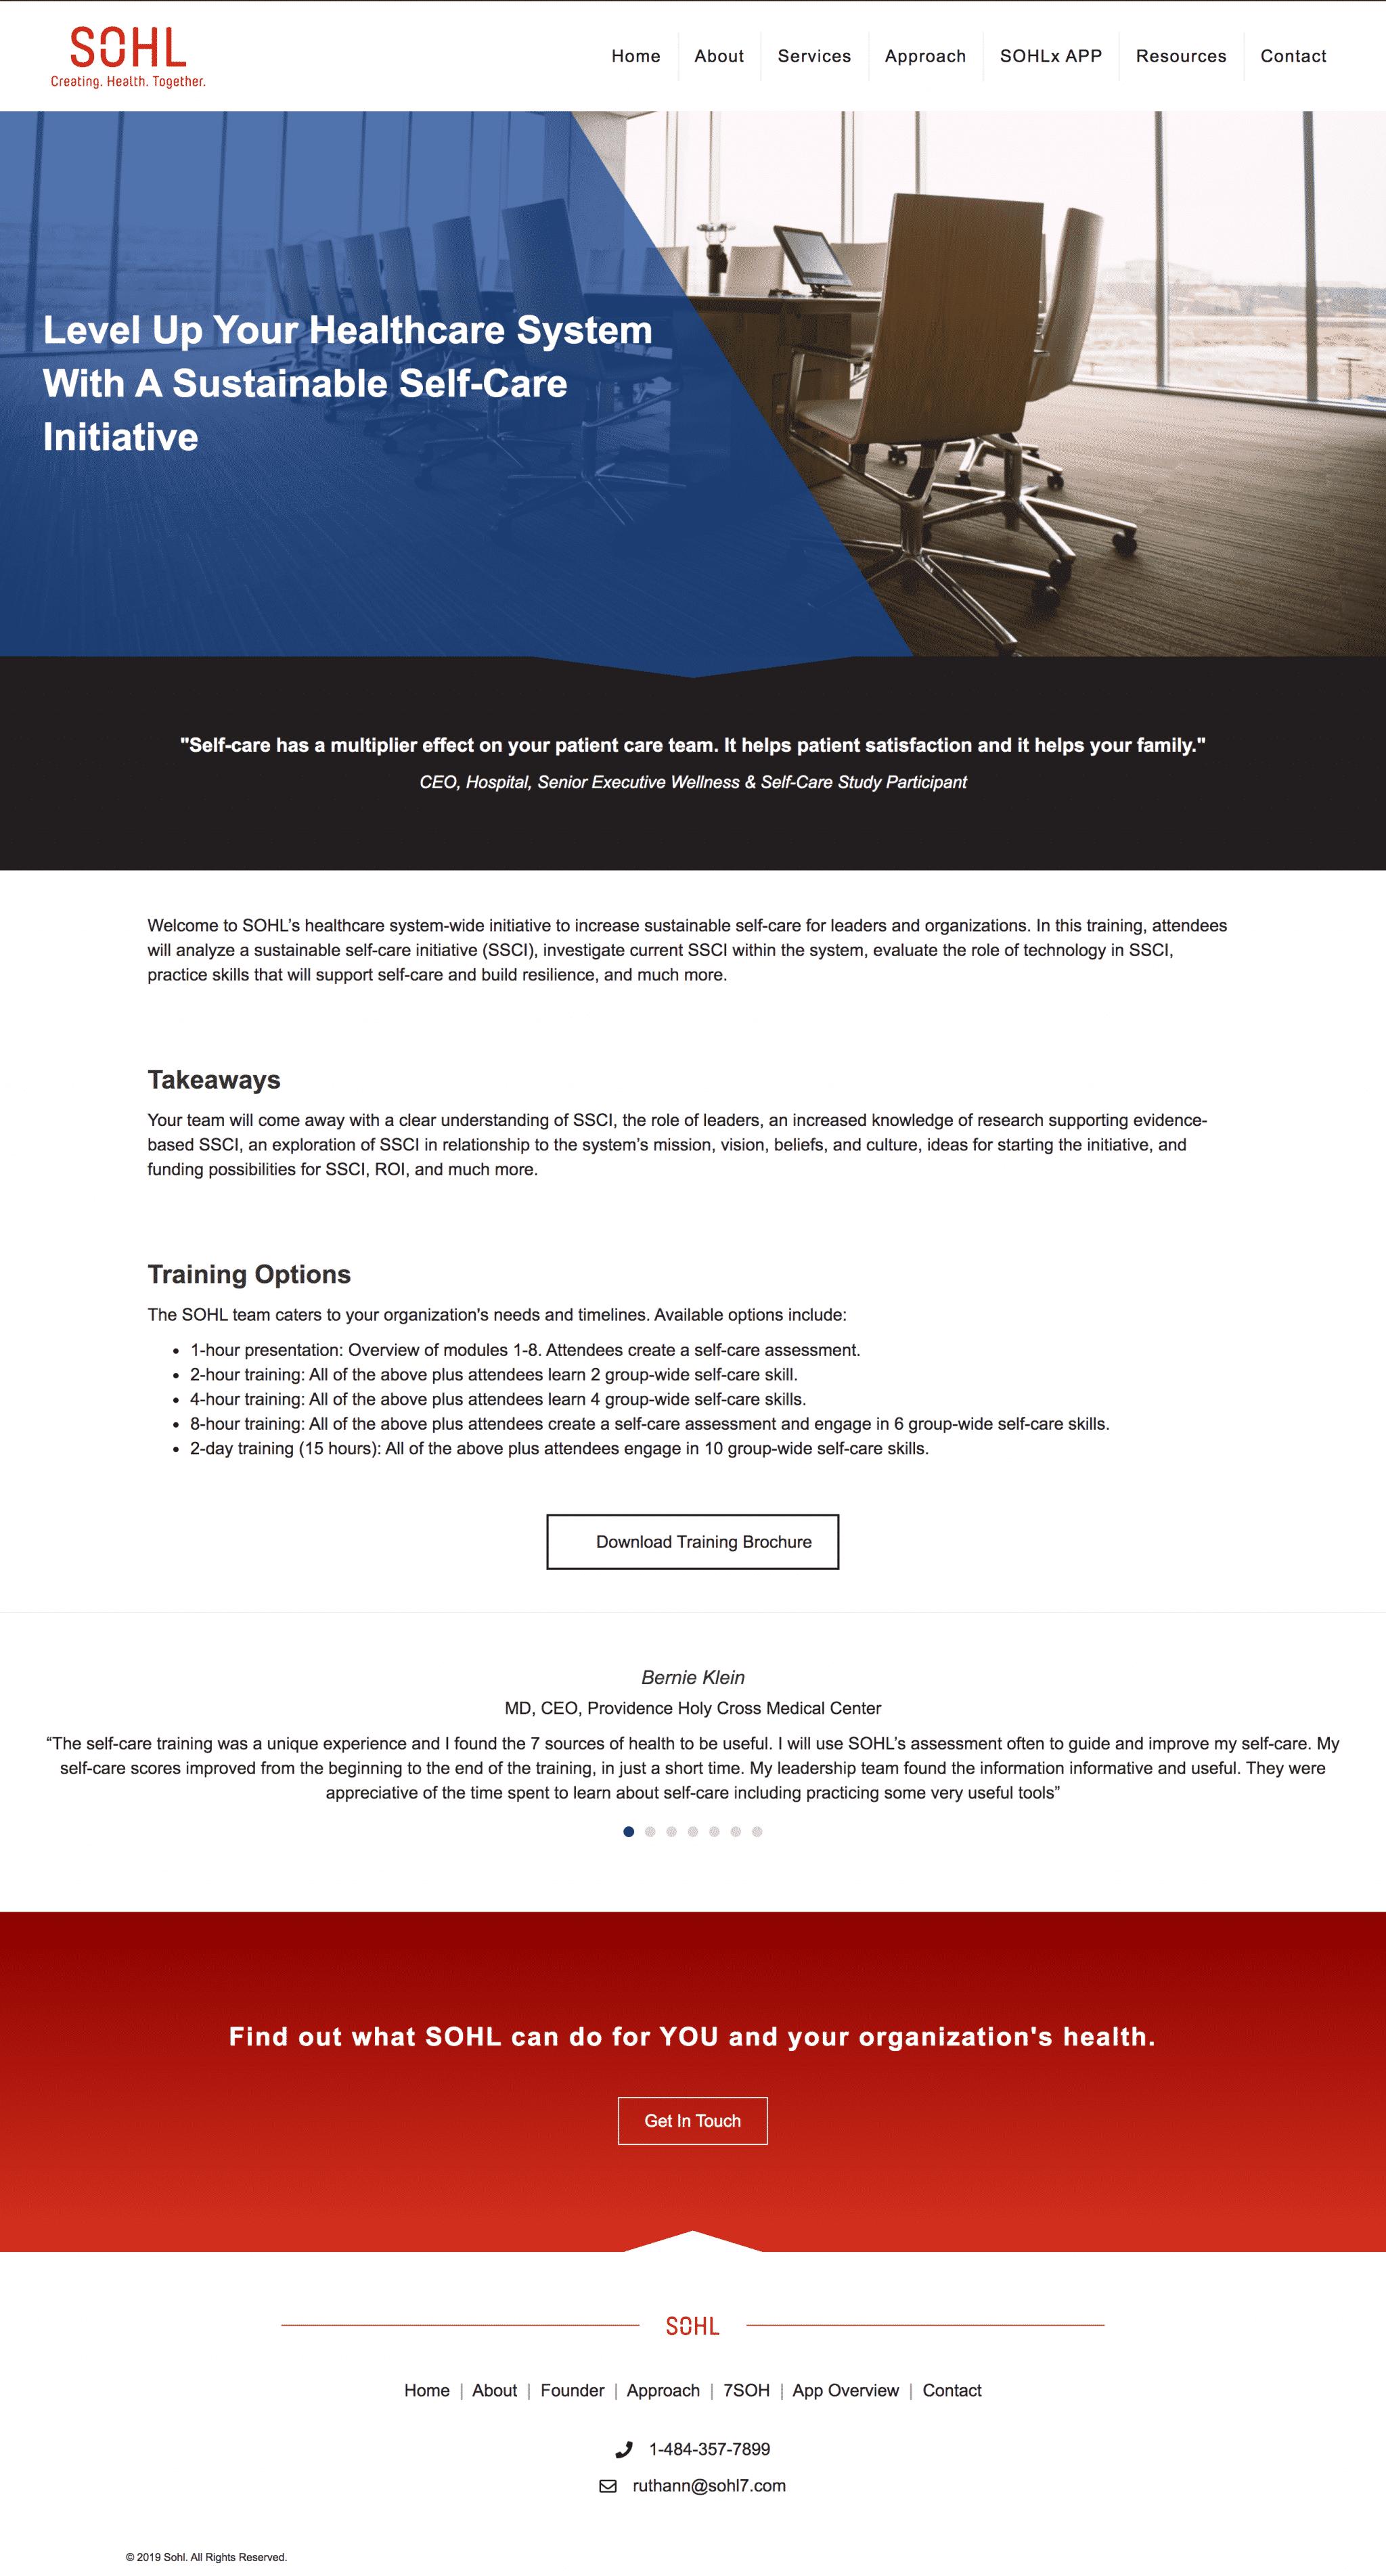 nj healthcare wellness web design